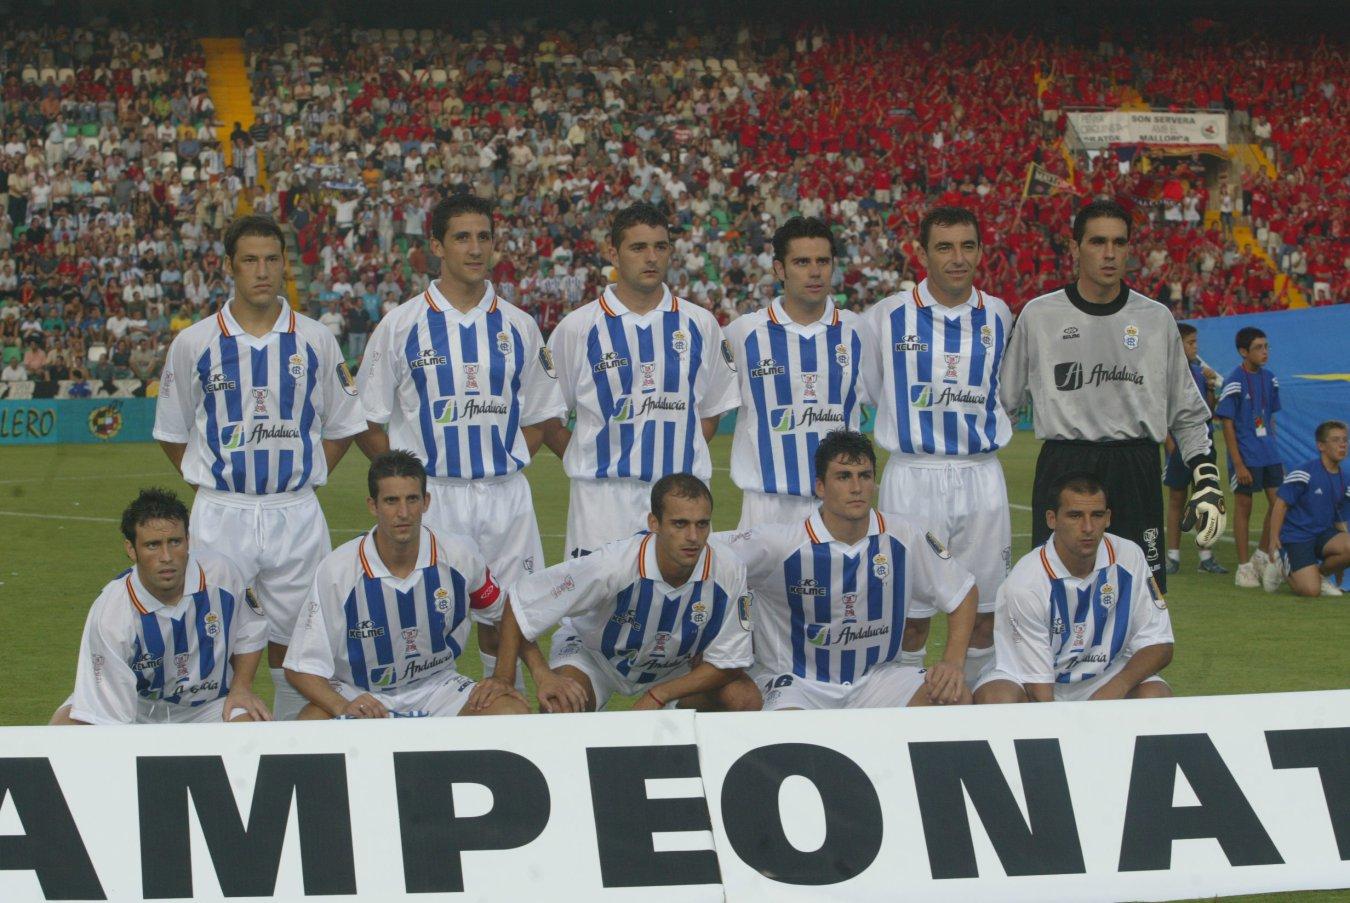 Recreativo de Huelva final Copa del Rey 2003